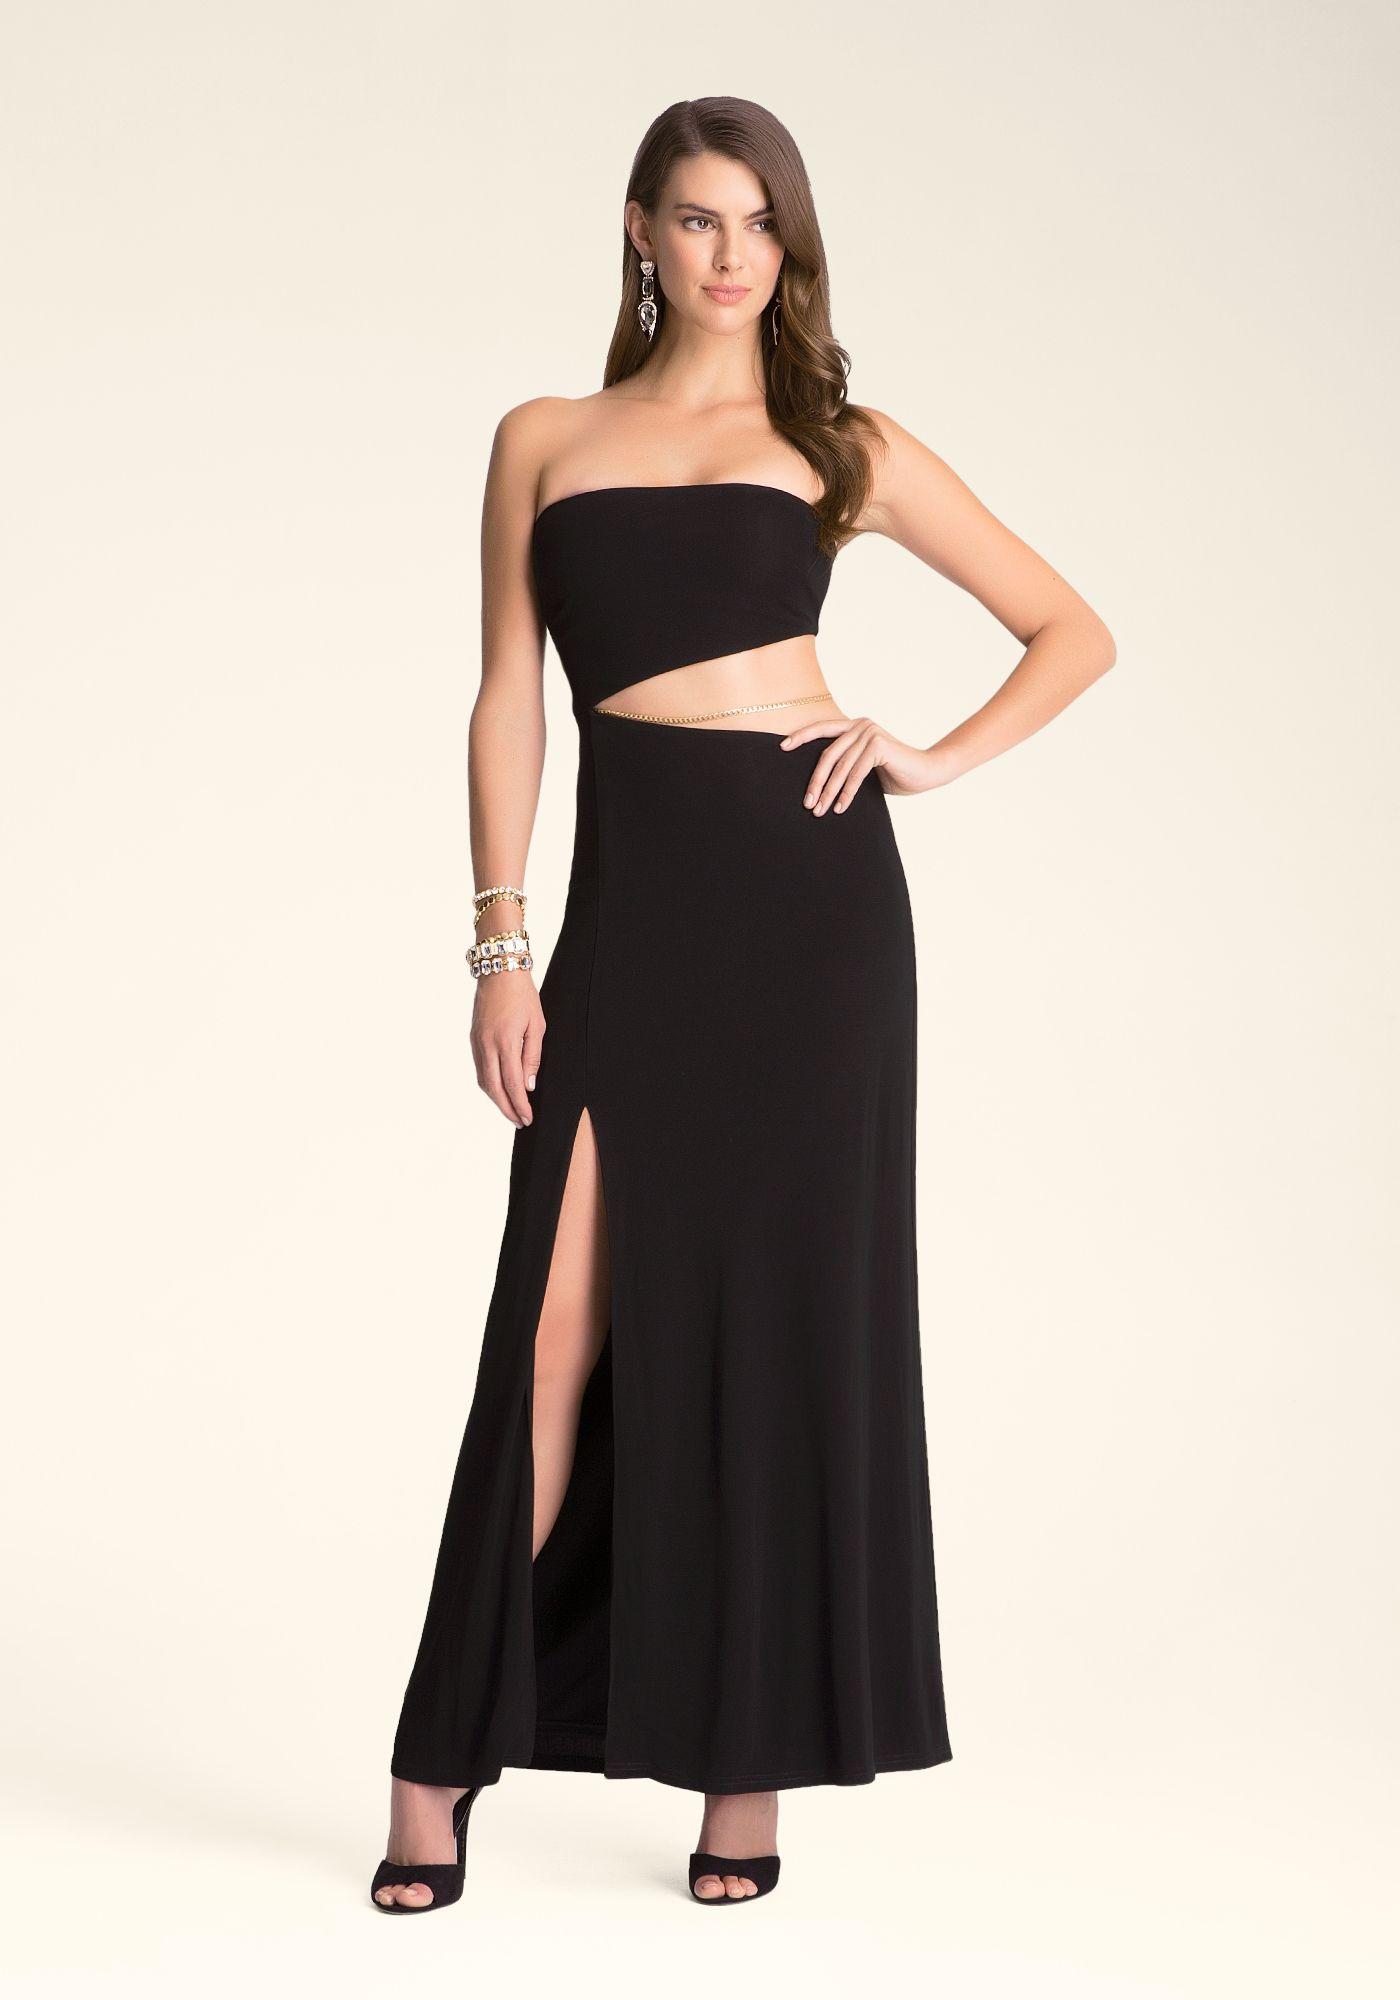 Bebe Strapless Cutout Maxi Dress Veronica Taylor 228552 Blk Cutout Maxi Dress Dresses Glam Maxi Dress [ 2000 x 1400 Pixel ]